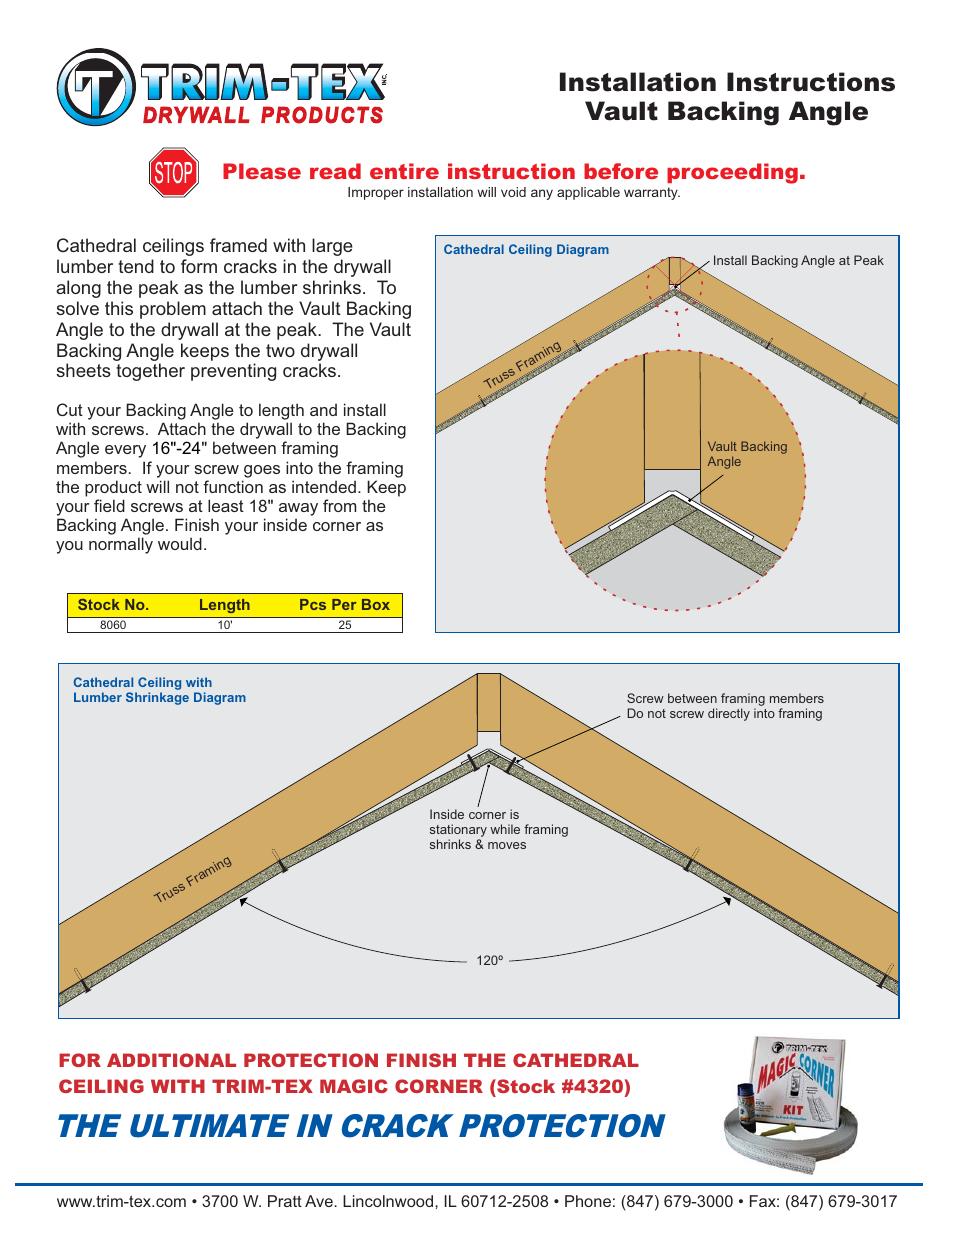 Trim-Tex Vault Backing Angle User Manual | 1 page